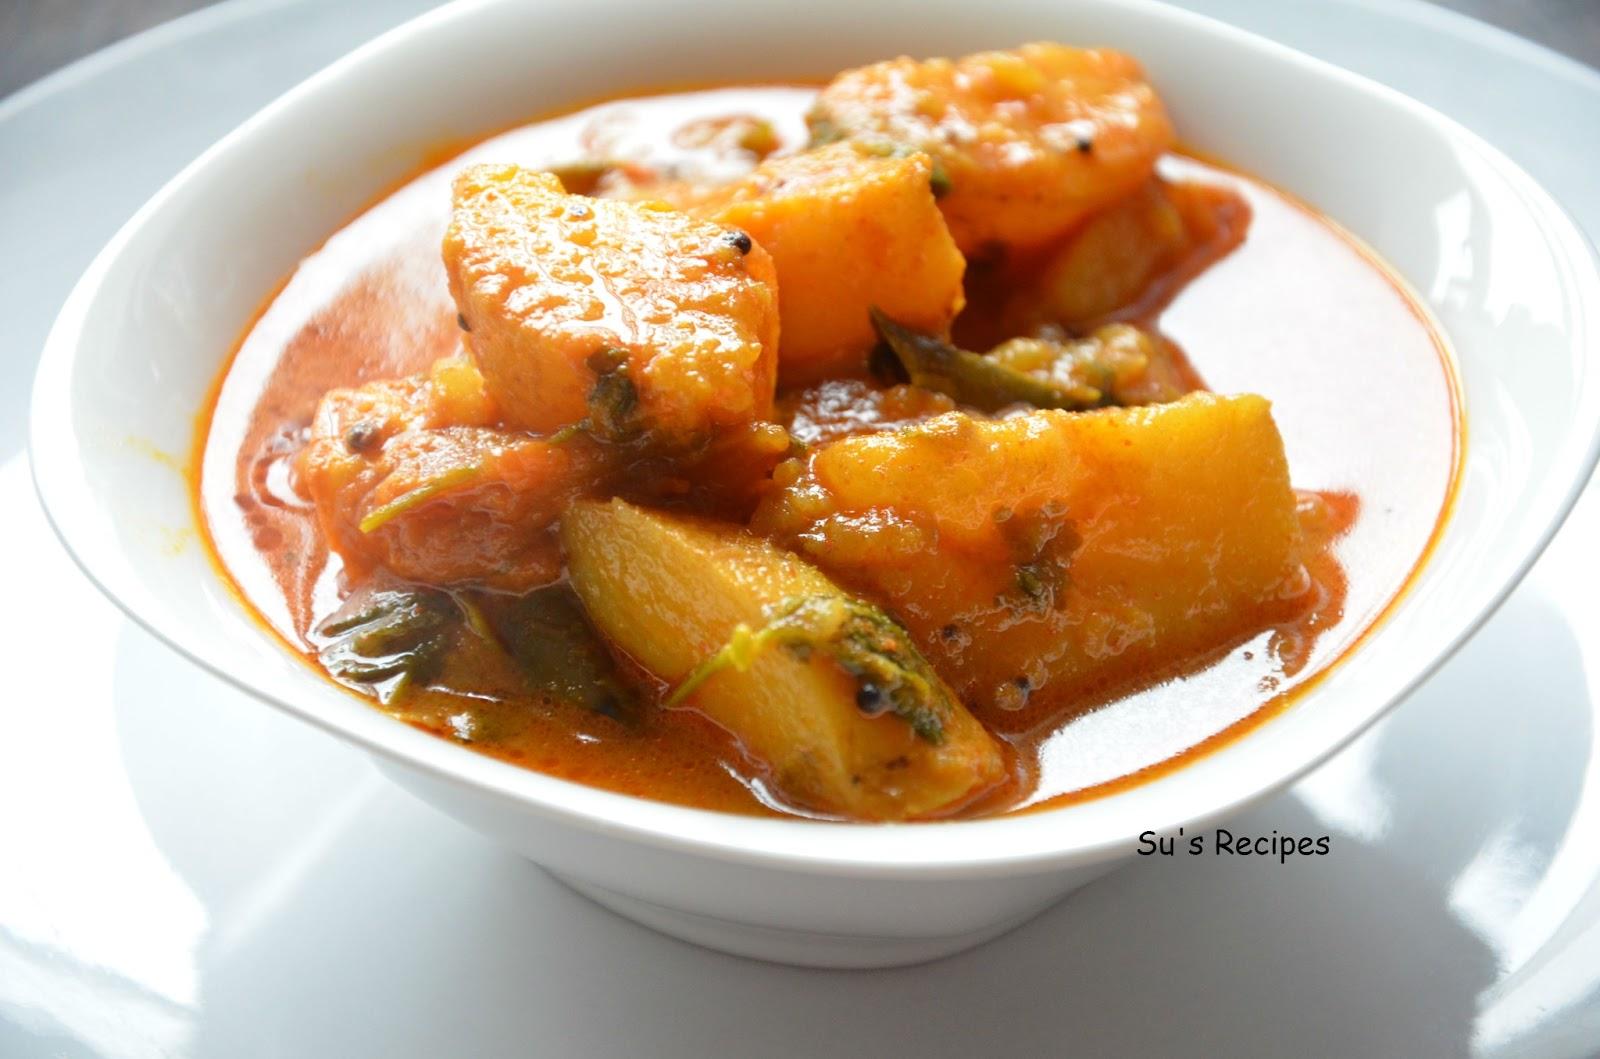 potato curry, potato gravy, simple gravy, quick gravy, aloo sabzi, aloogadde, bangaladumppa pulusu